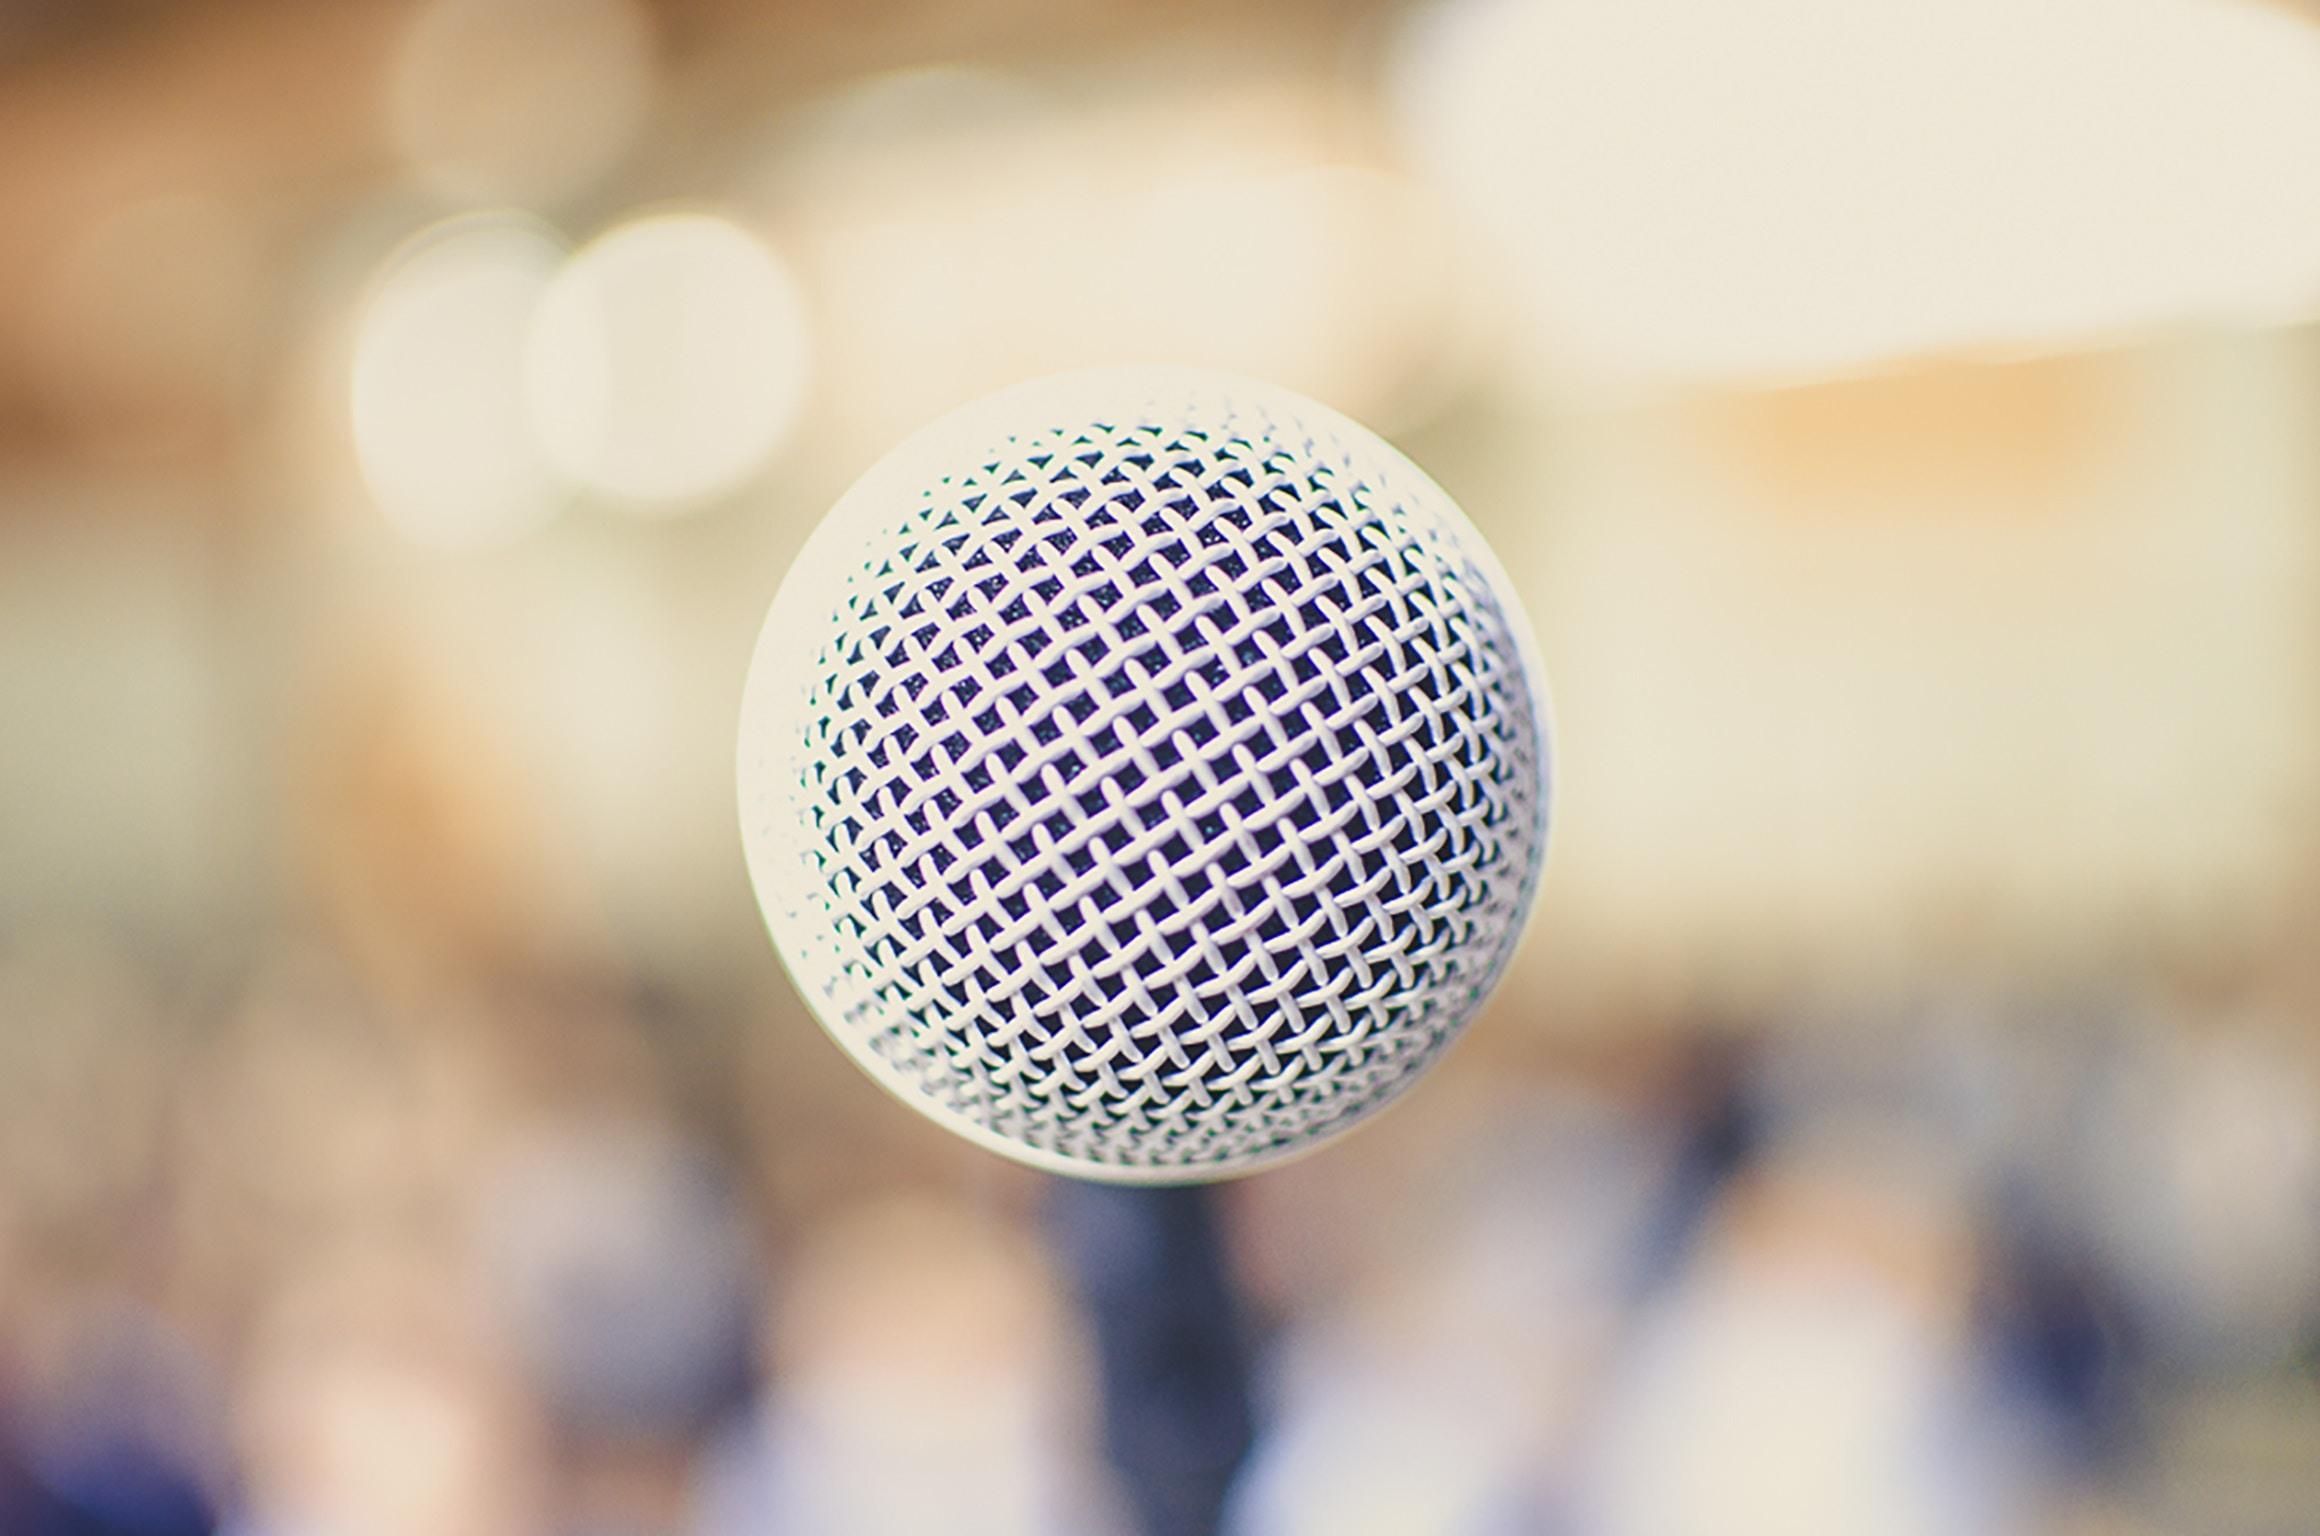 Presentere innhold foran publikum